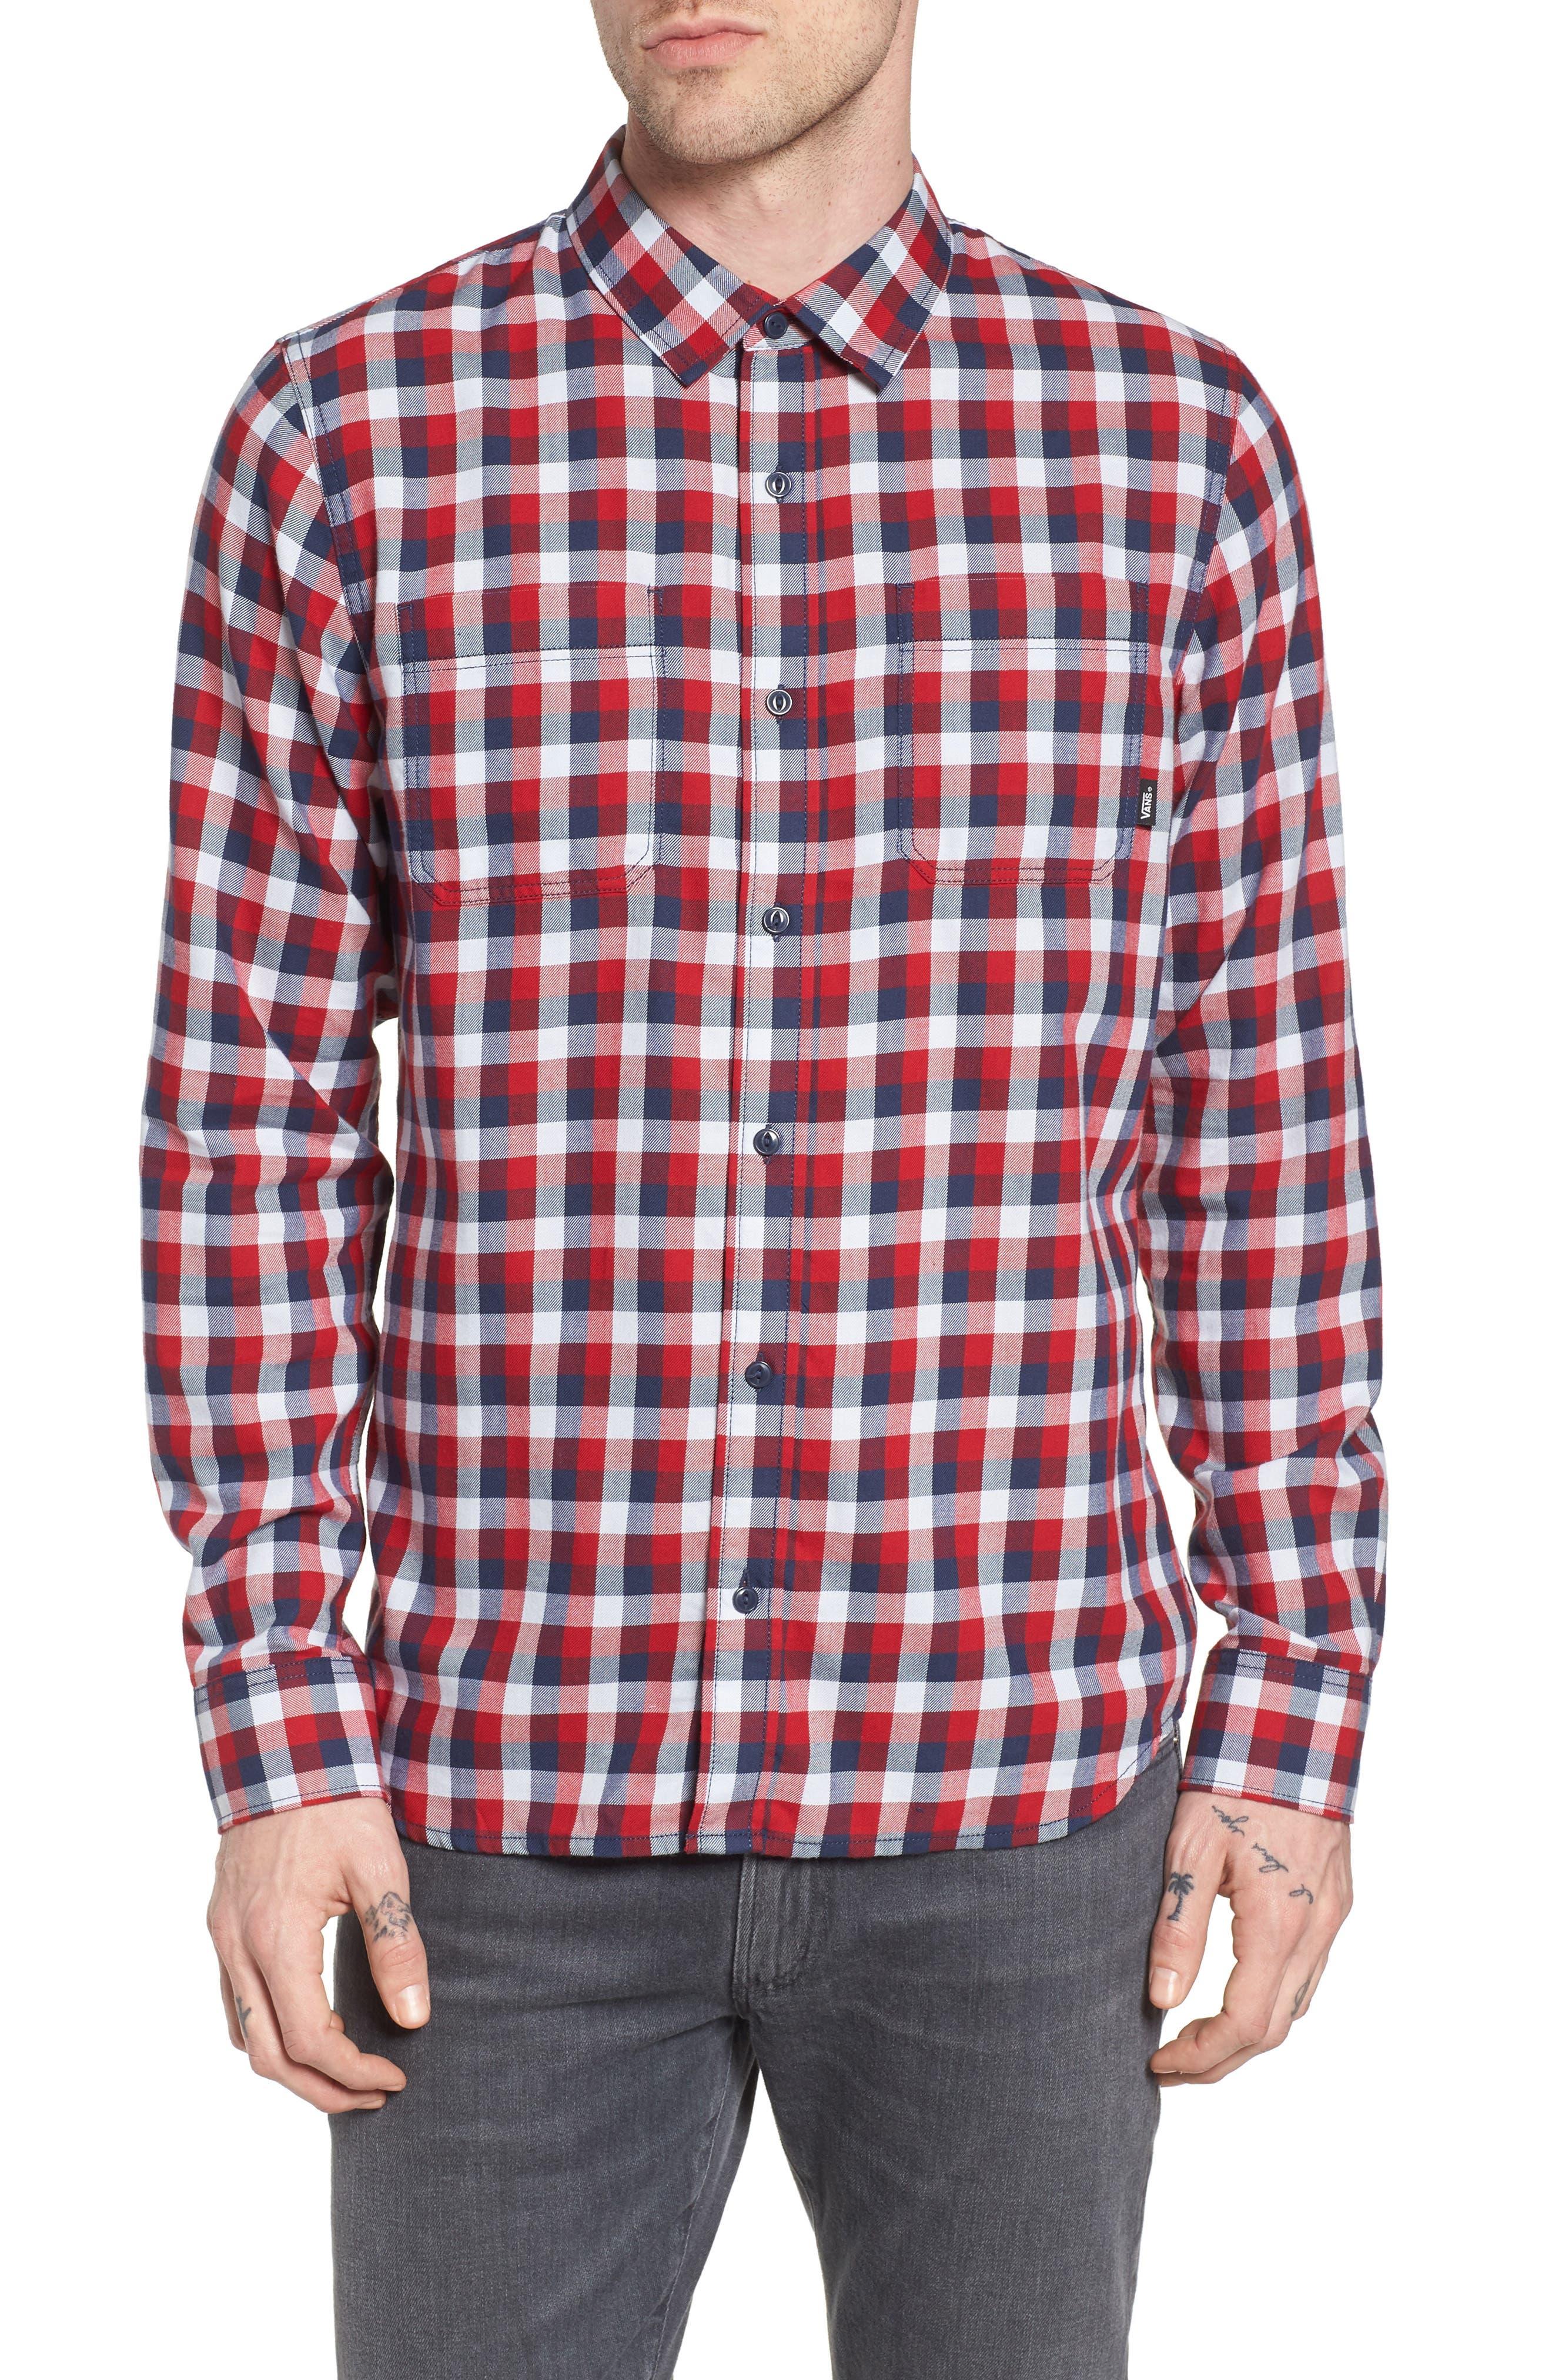 Main Image - Vans Alameda II Plaid Flannel Shirt